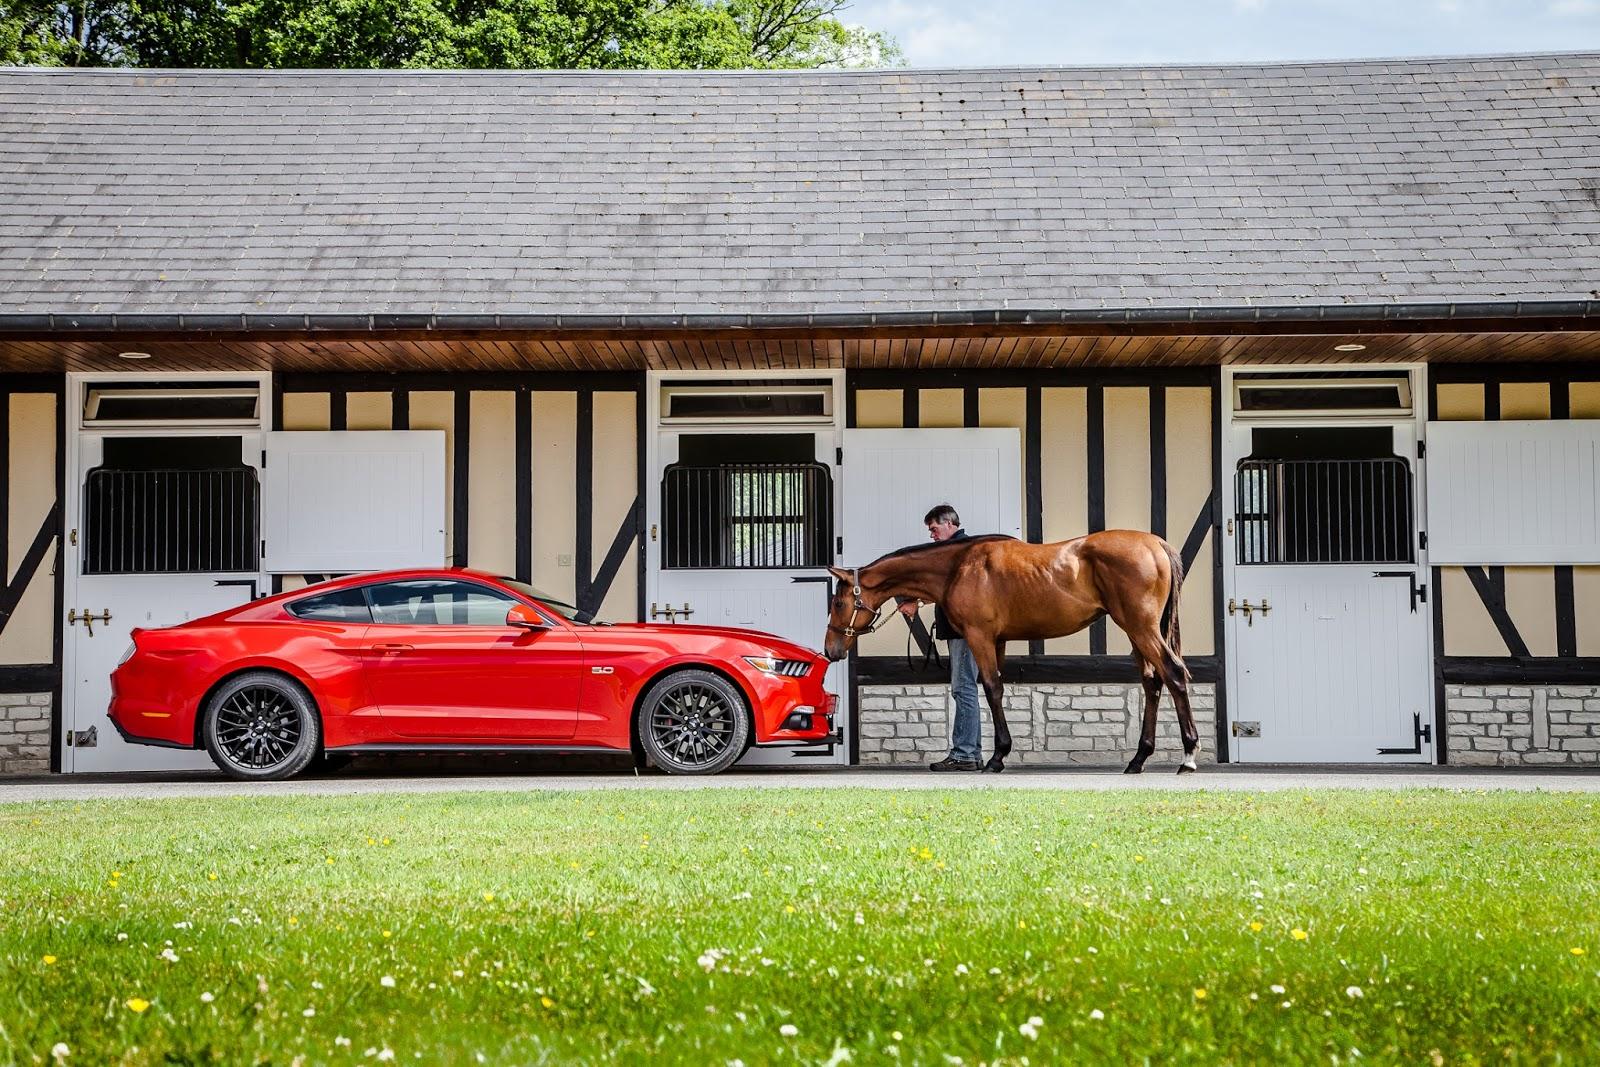 MustangDriveDeauville2015 14 Άνοδος Ευρωπαϊκών πωλήσεων για την Ford Ford, Sales, πωλήσεις, πωλήσεις αυτοκινήτων